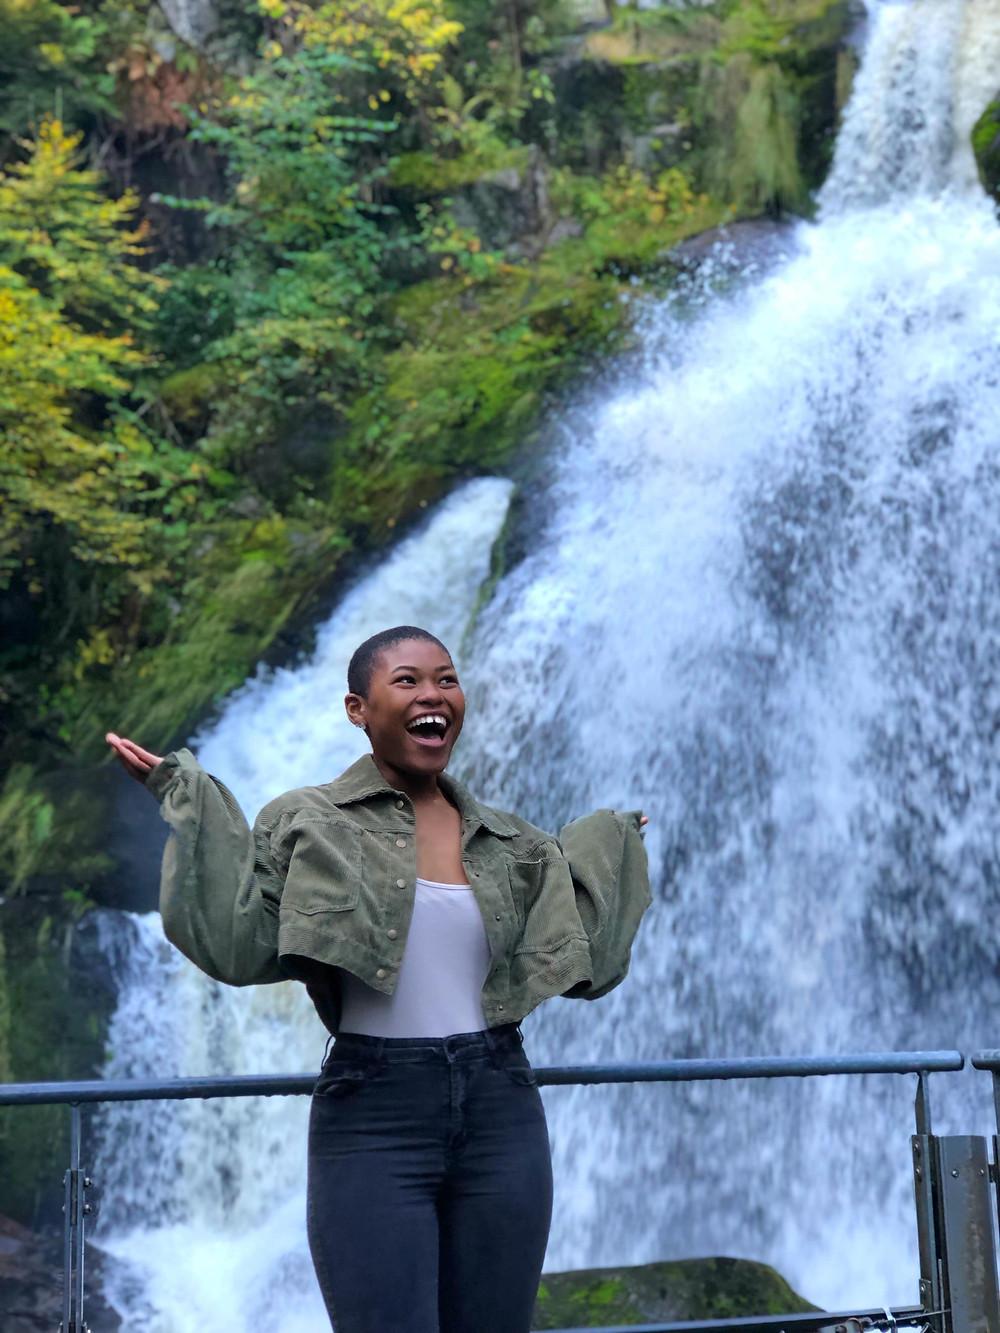 posing by waterfall in Germany